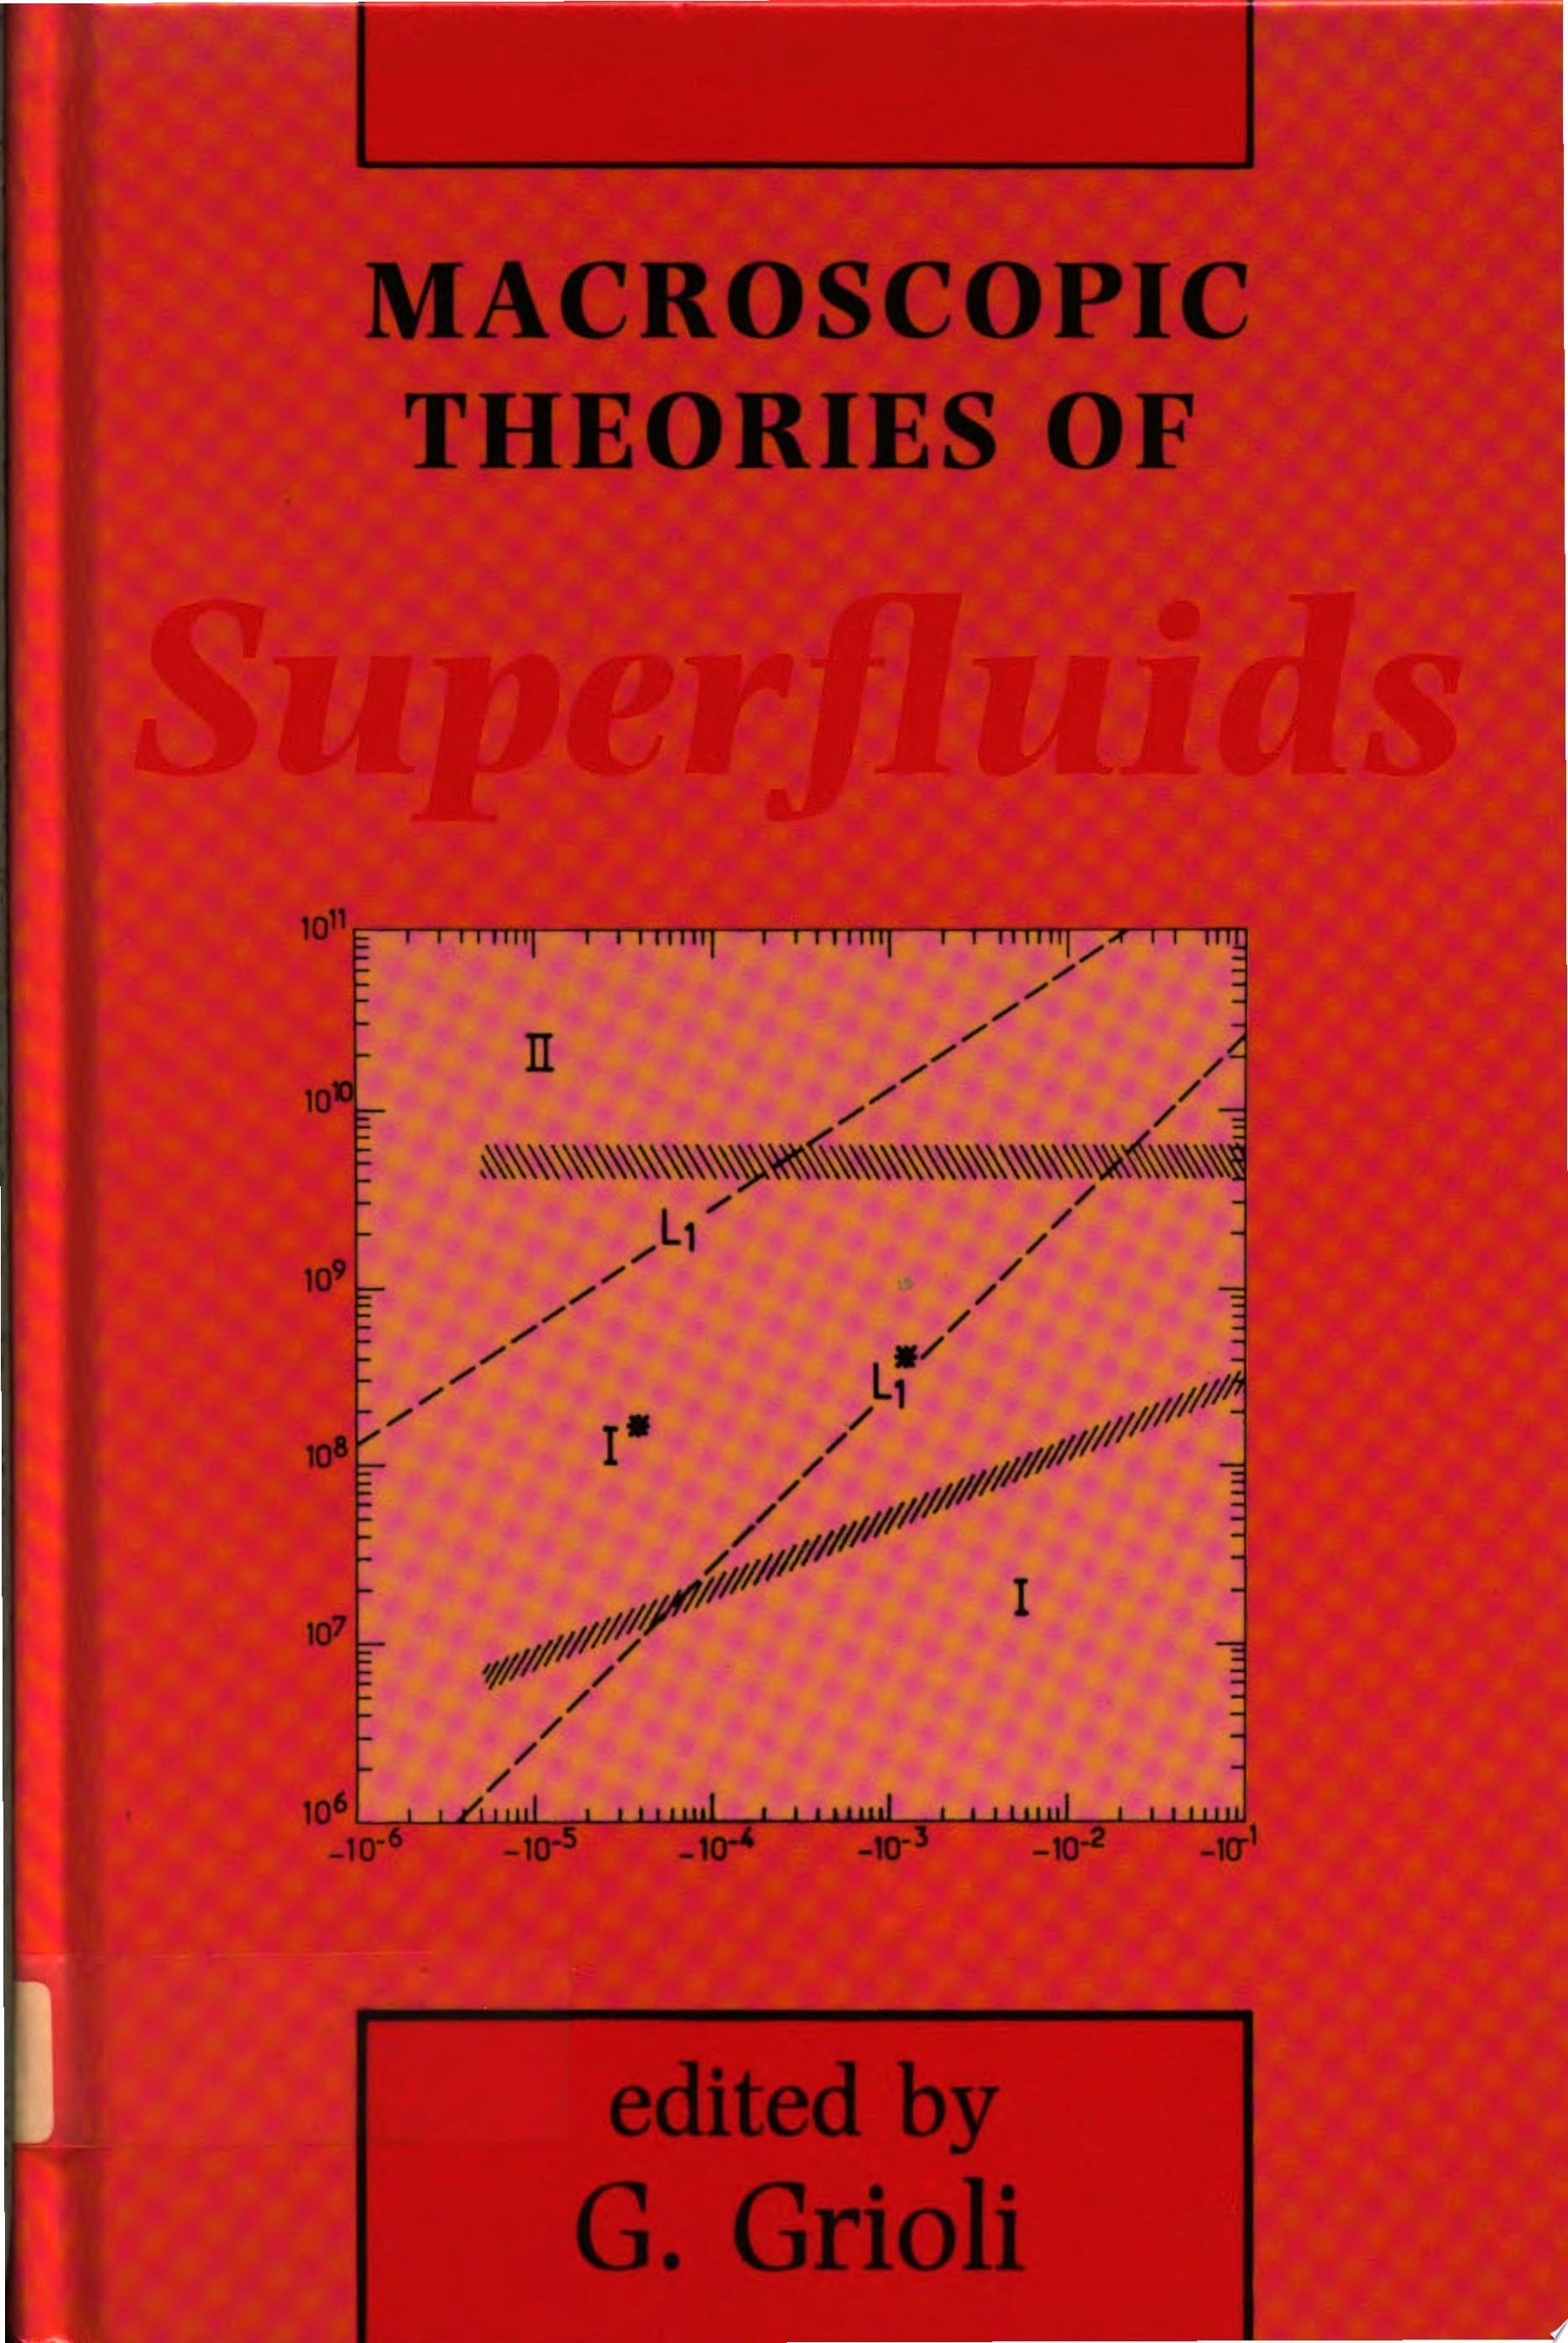 Macroscopic Theories of Superfluids